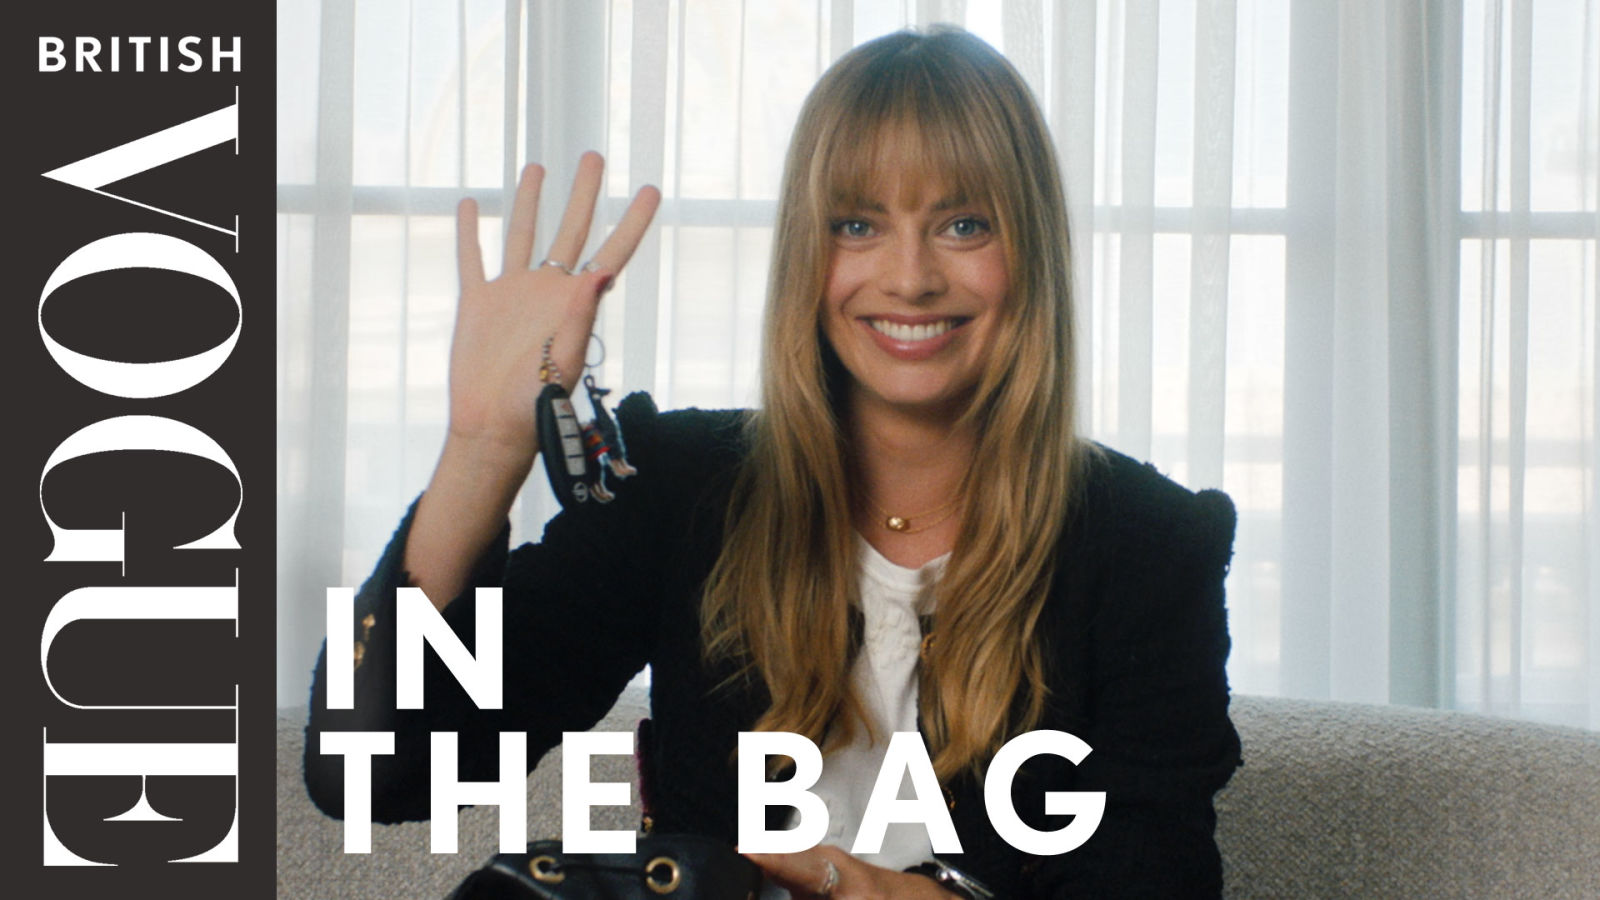 Margot Robbie: In The Bag